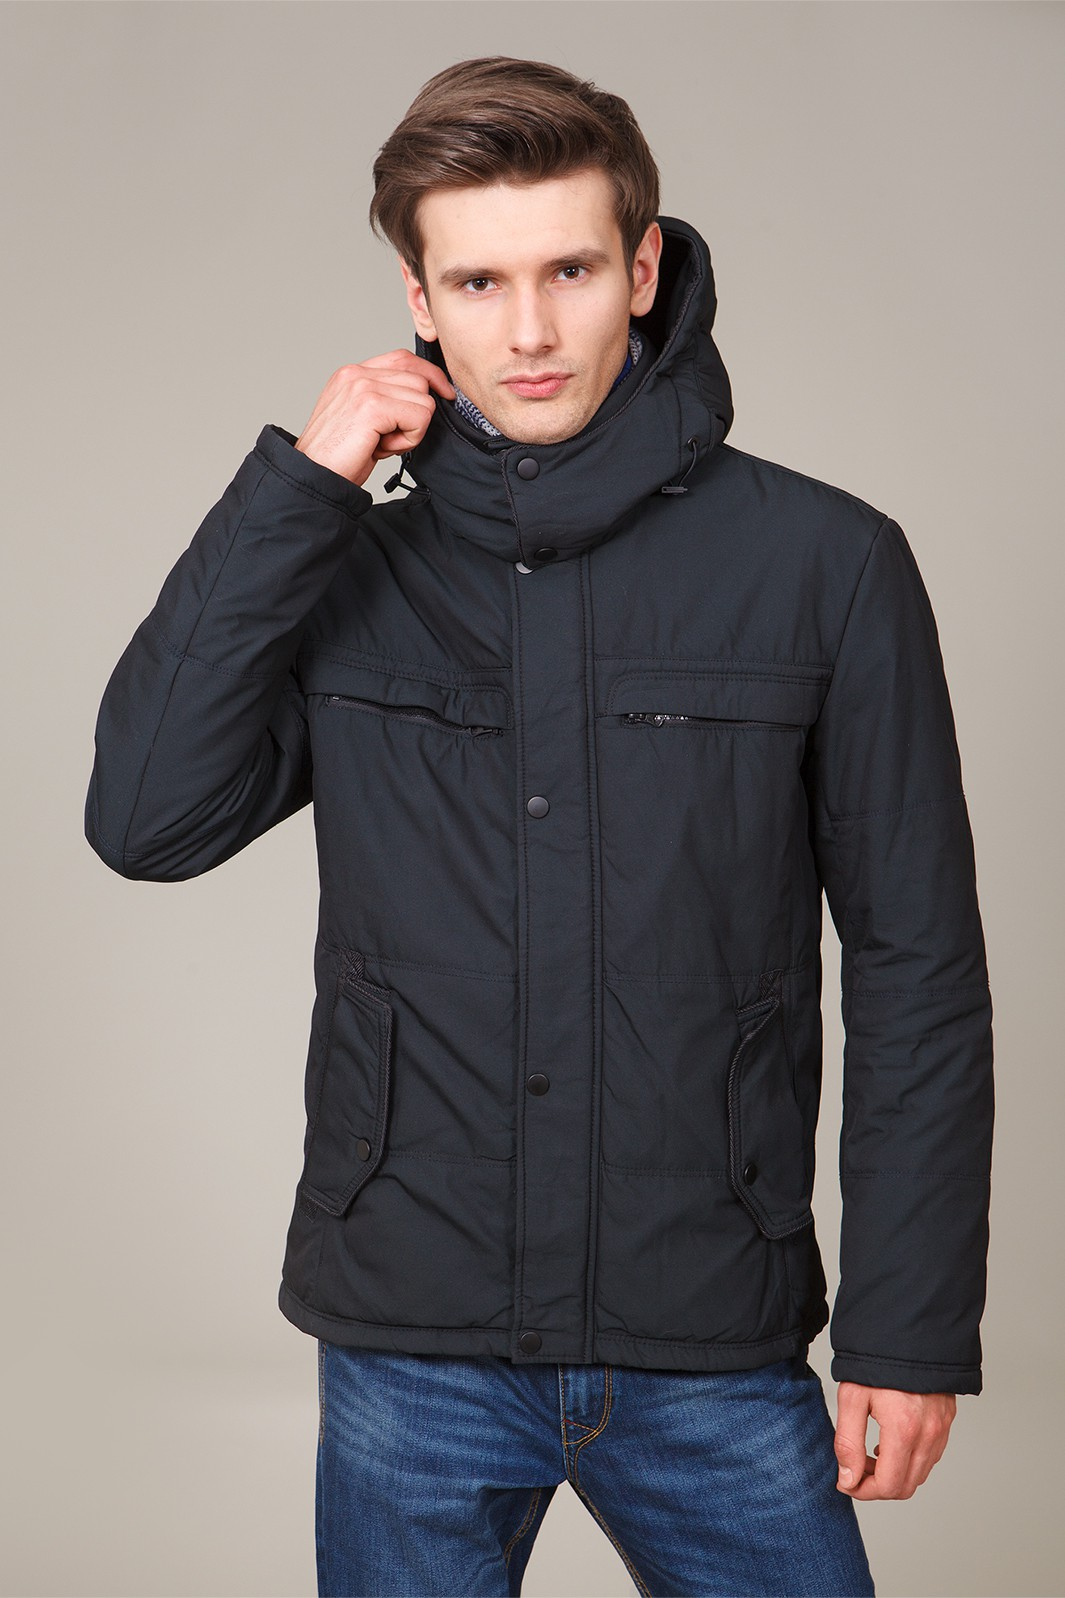 Купить Осеннюю Куртку Фамилия